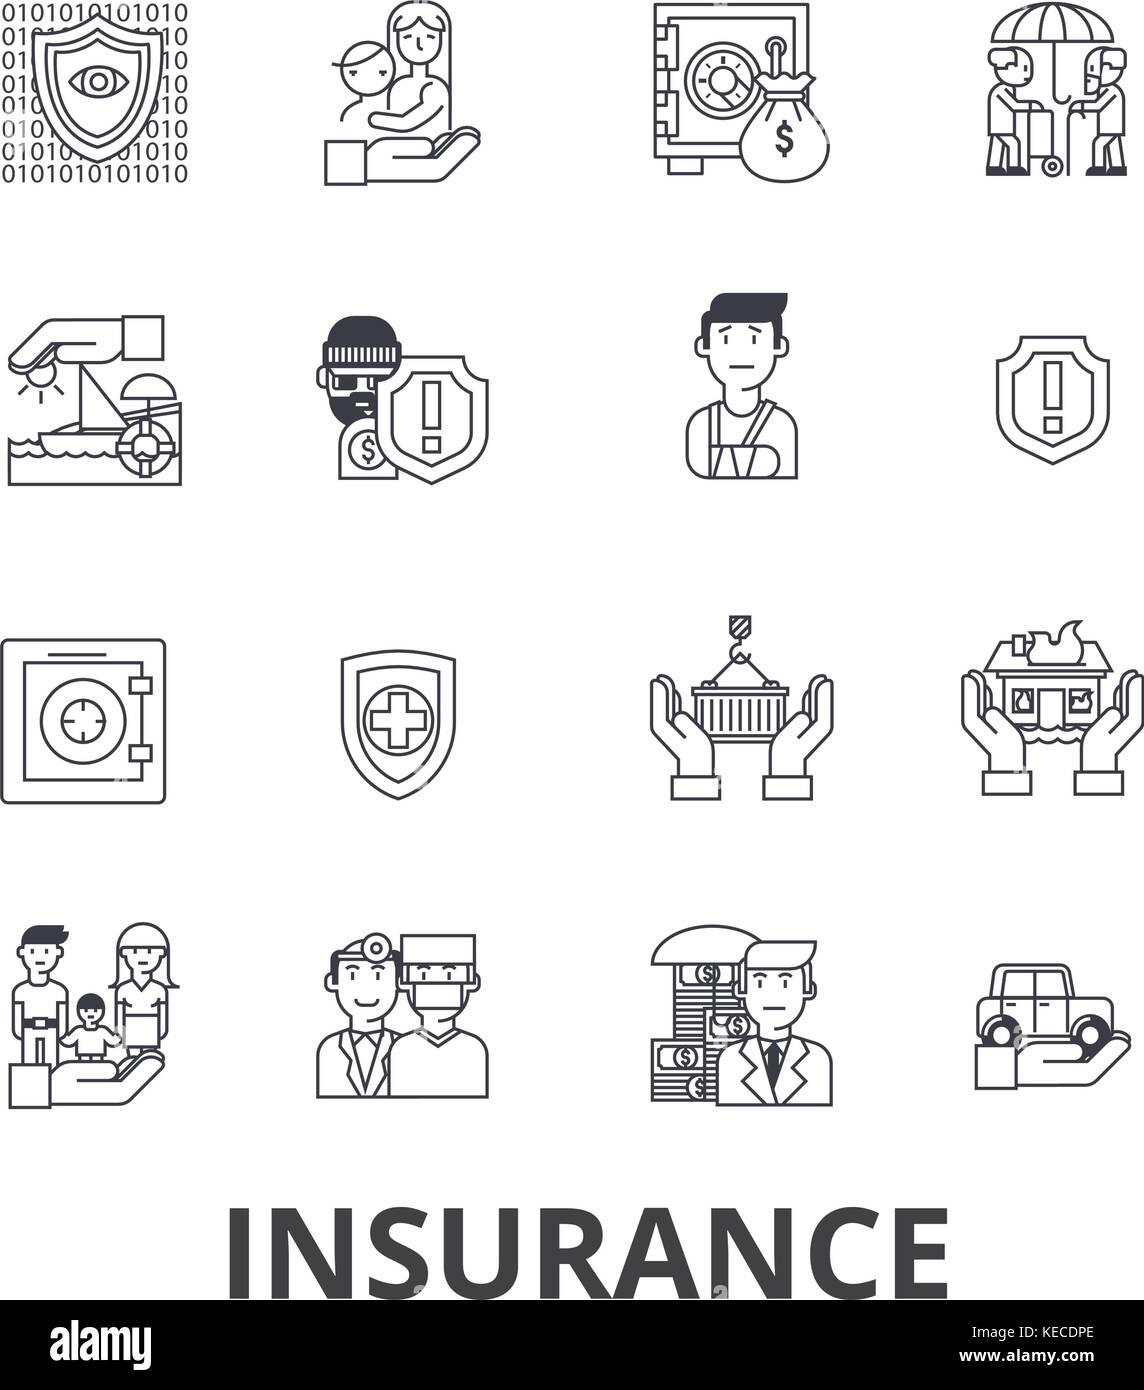 Insurance Health Insurance Insurance Agent Life Insurance Stock